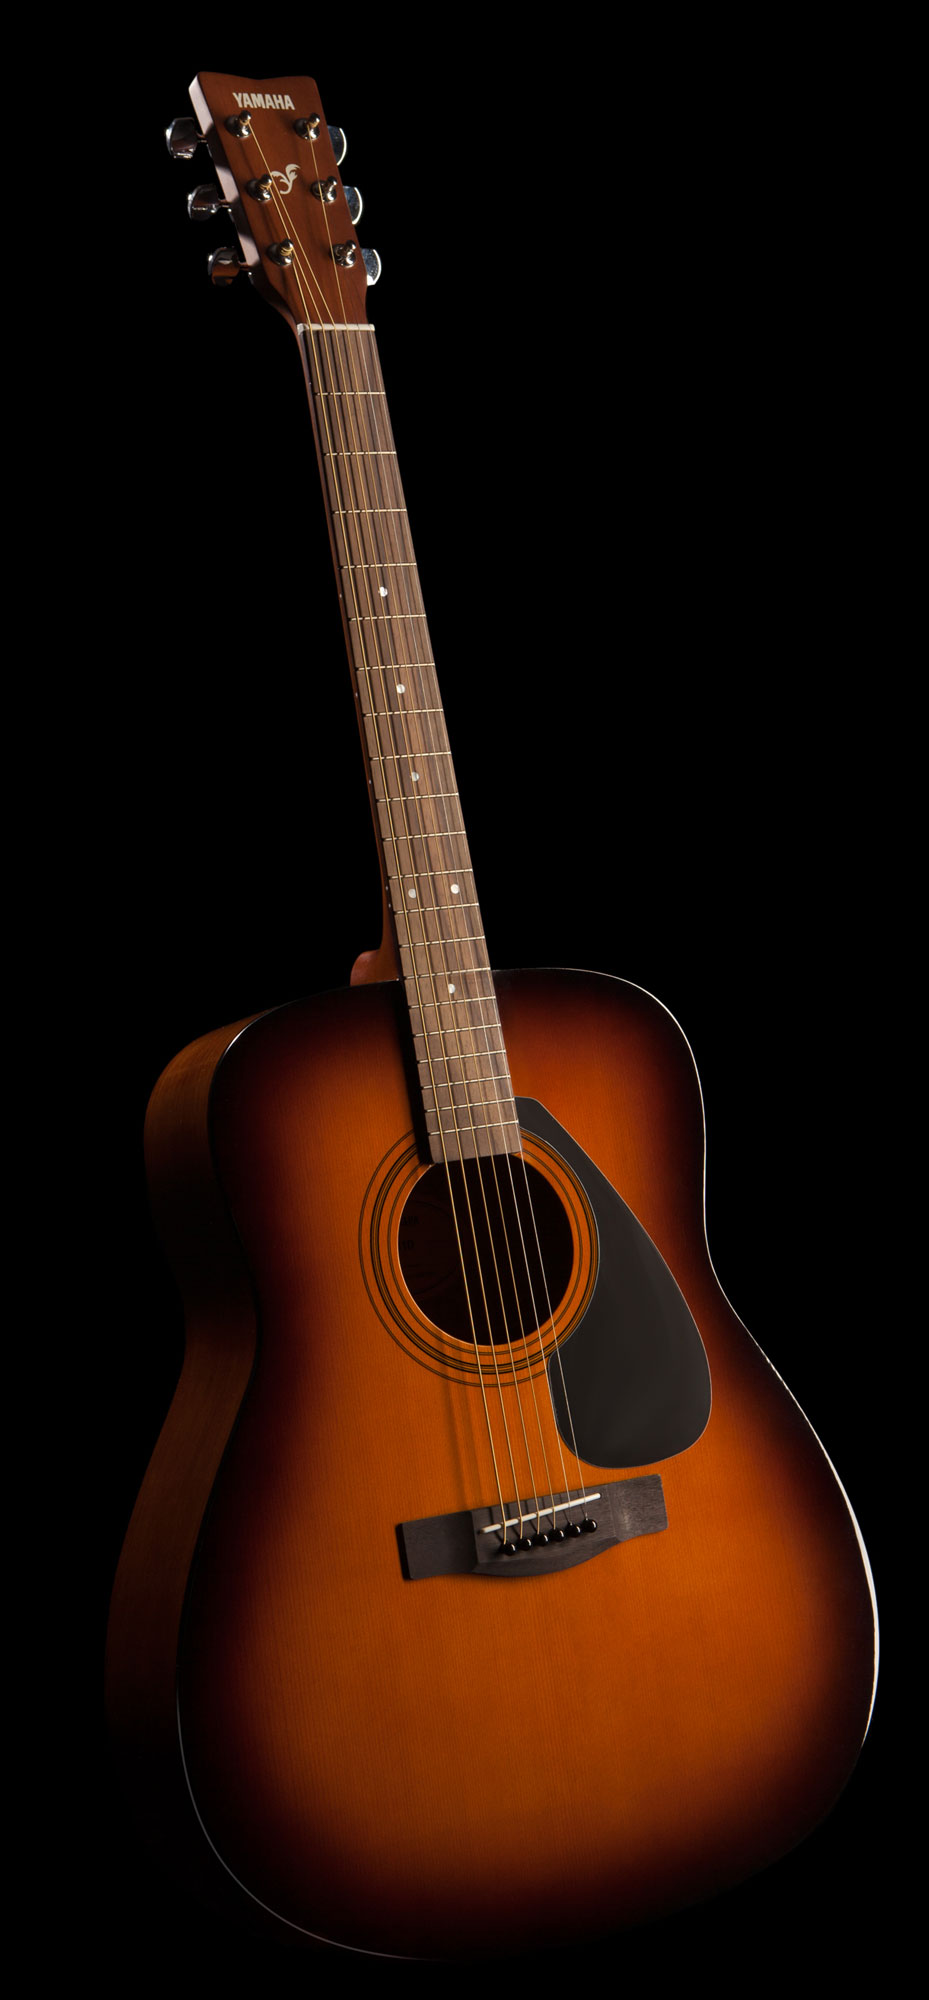 F310 Acoustic Guitar In Tobacco Brown Sunburst Finish